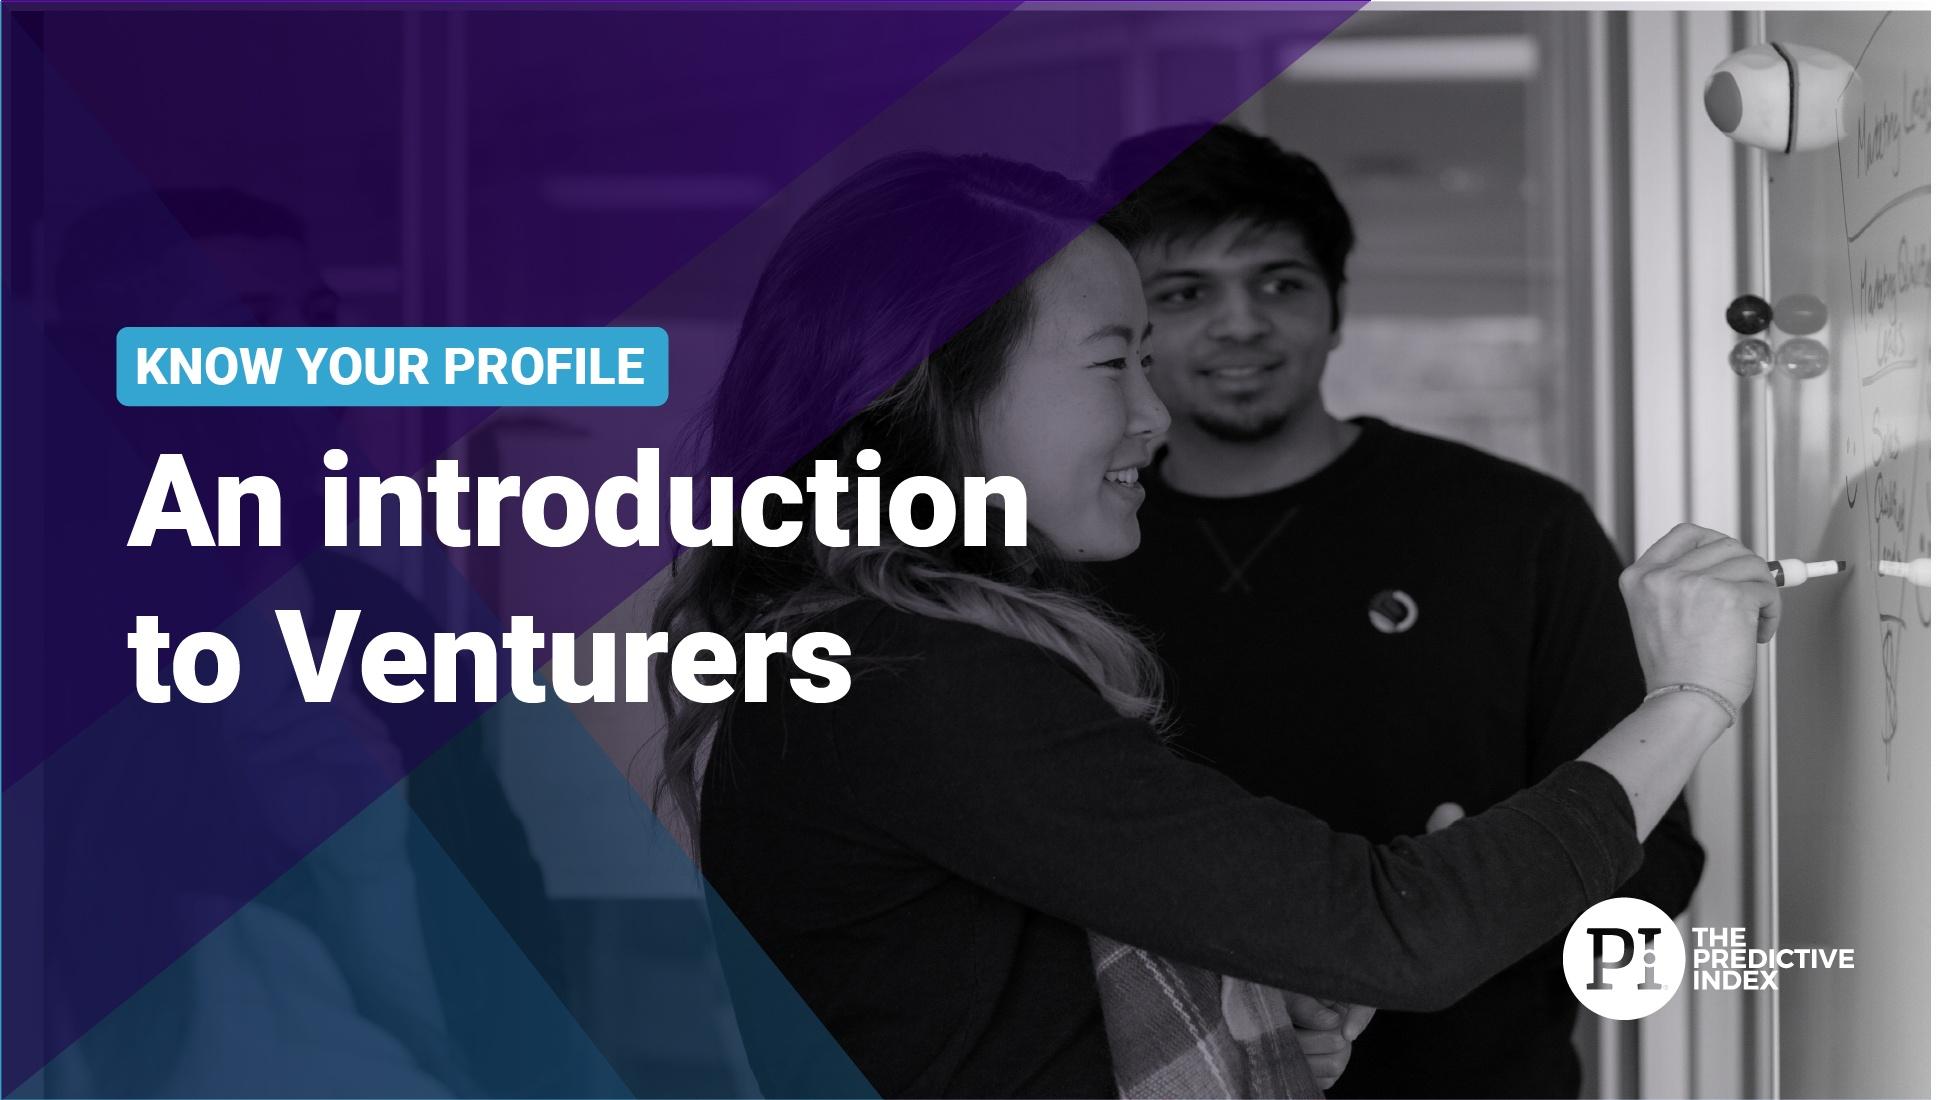 Introducing the Venturer